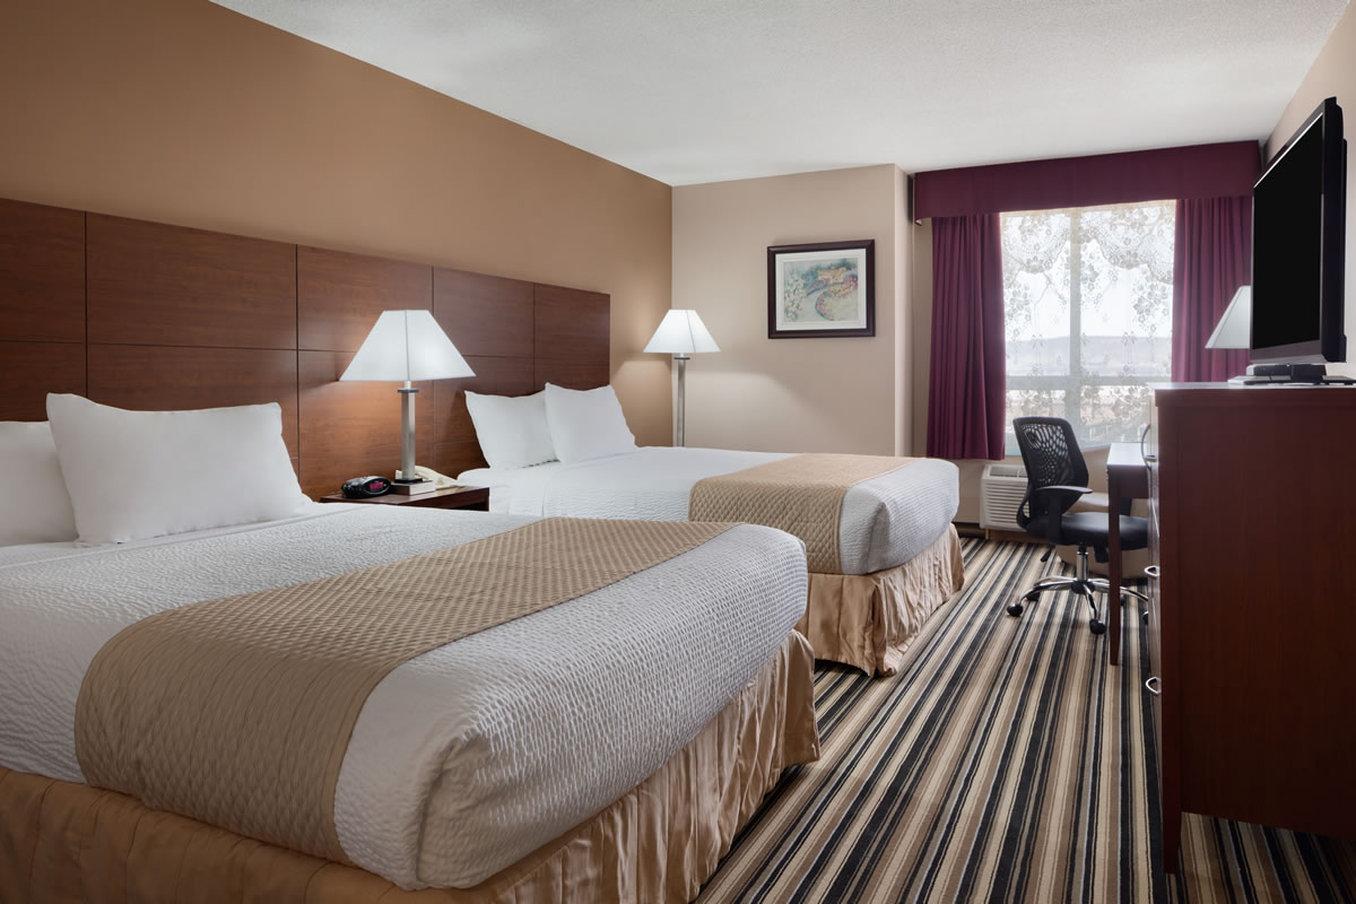 dalhousie-hotel-double-beds